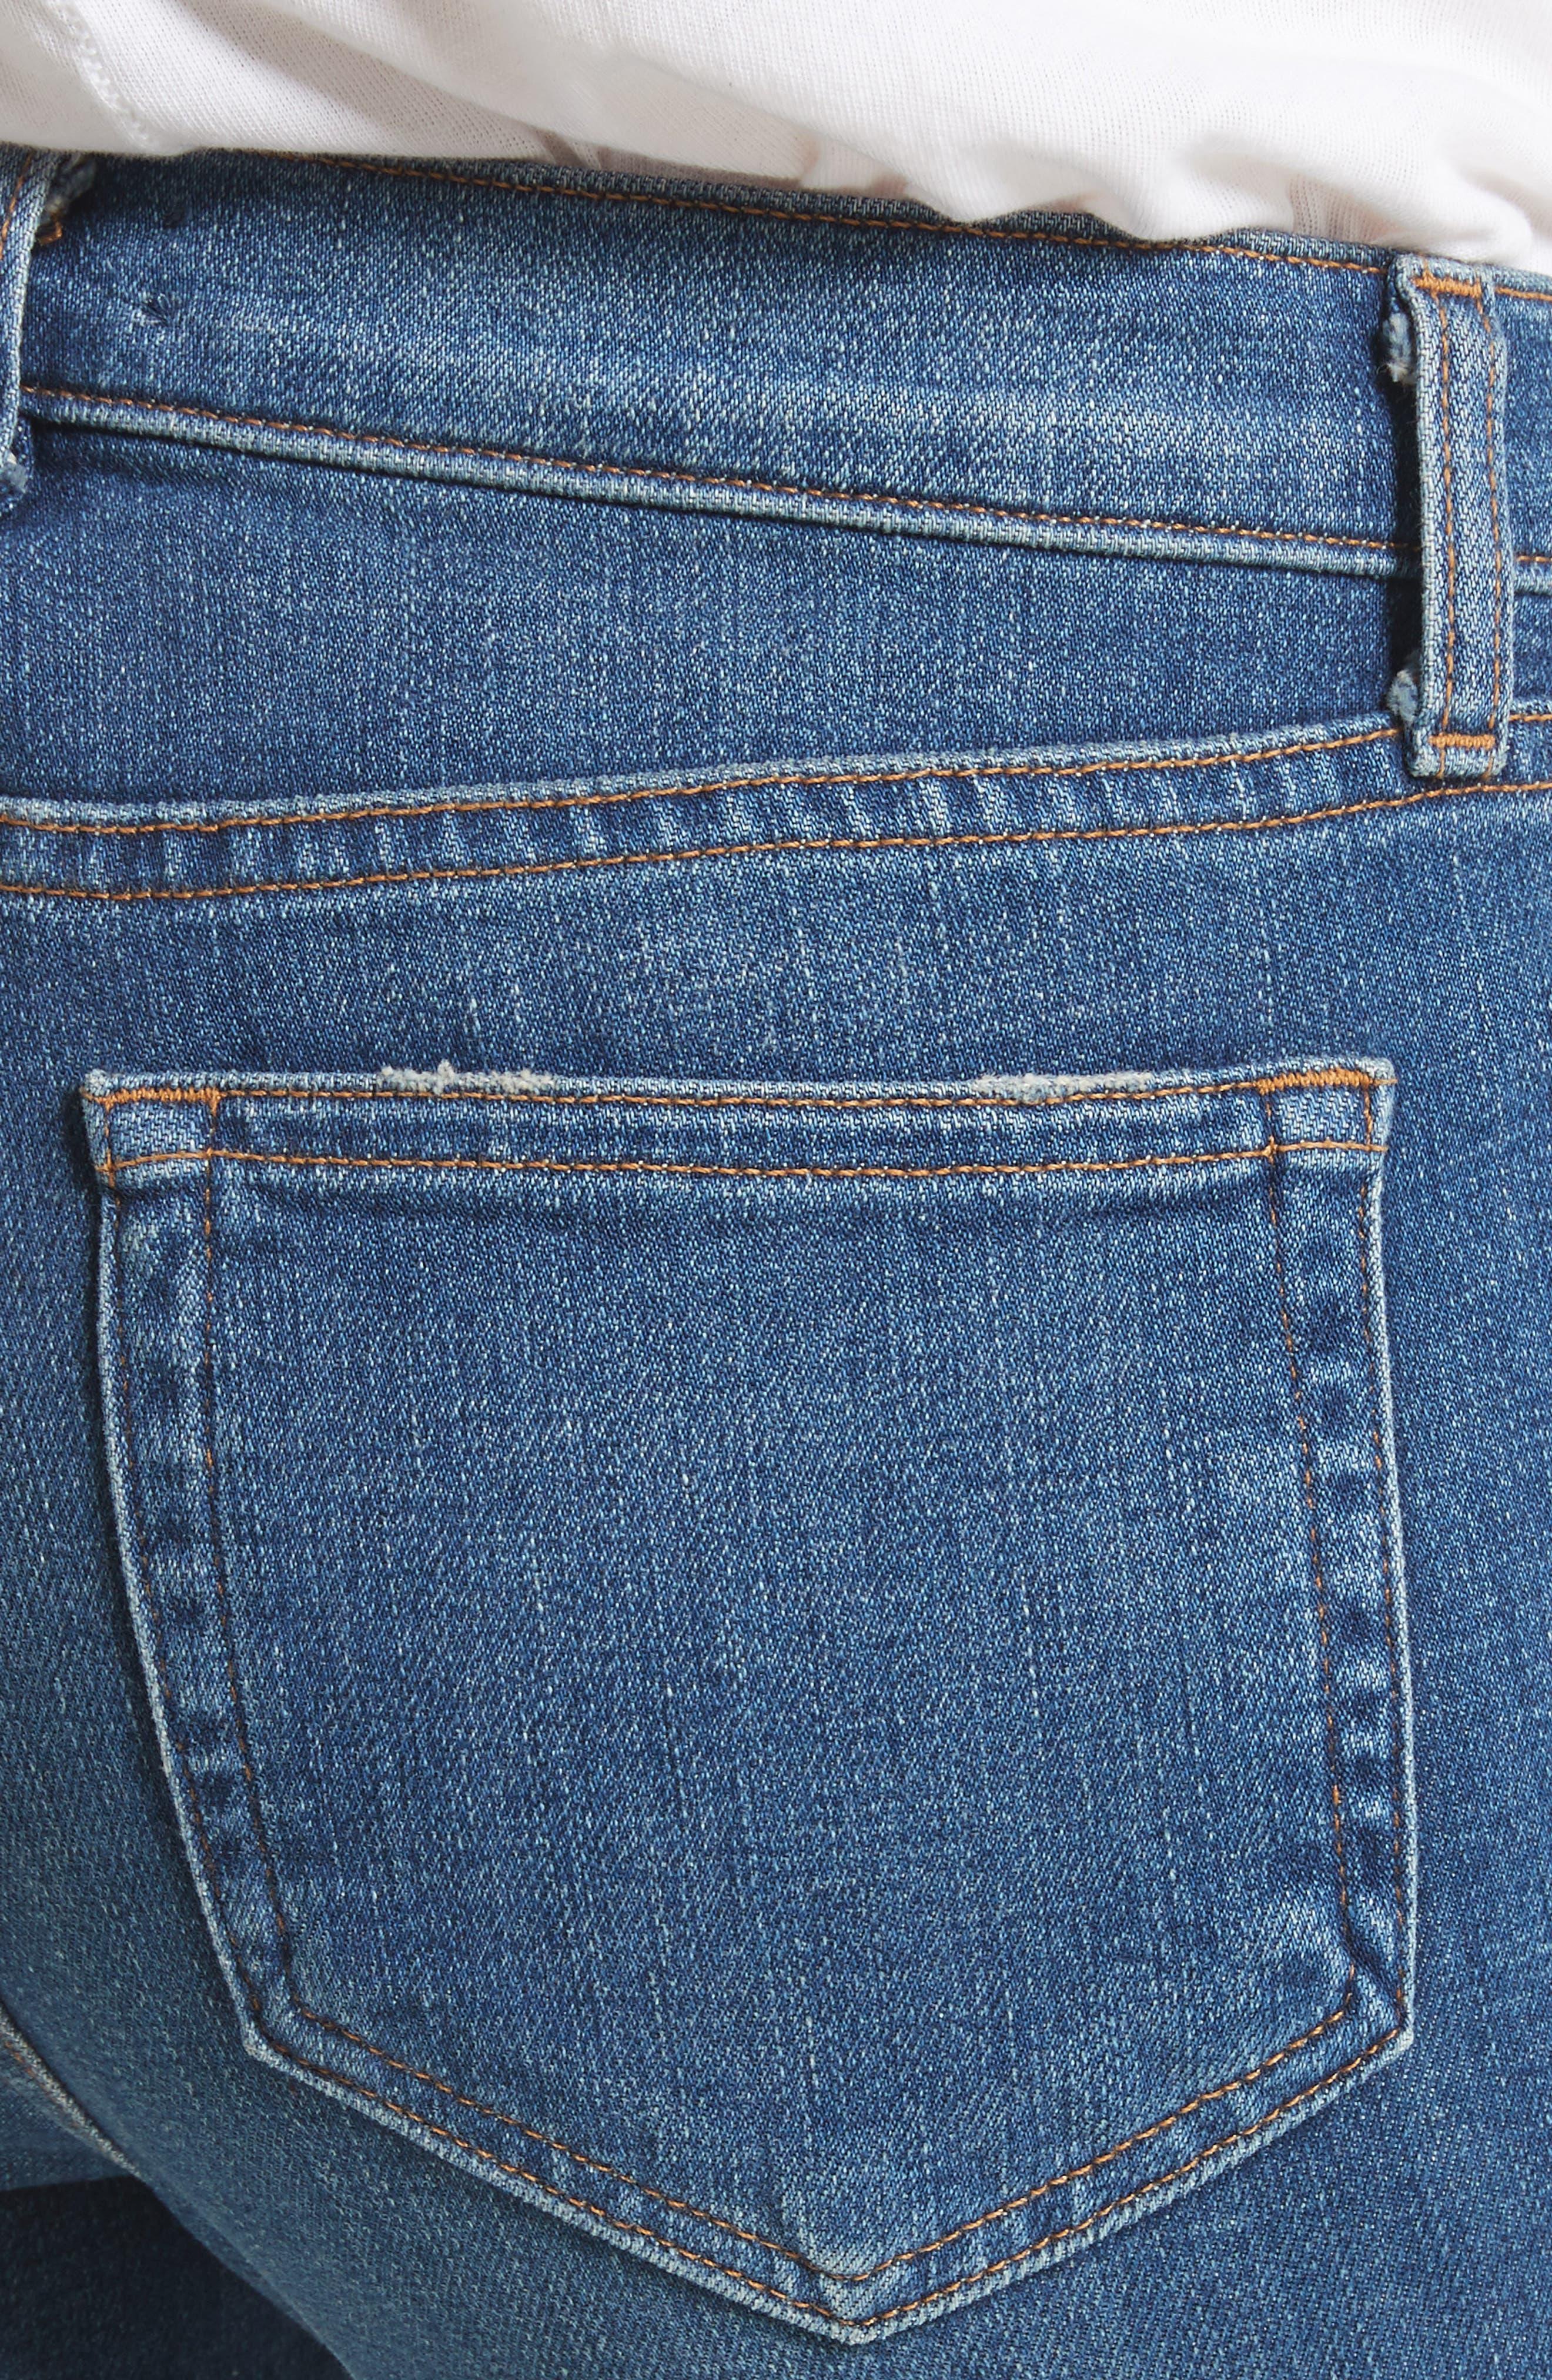 Anjelique Studded Ankle Skinny Jeans,                             Alternate thumbnail 4, color,                             400